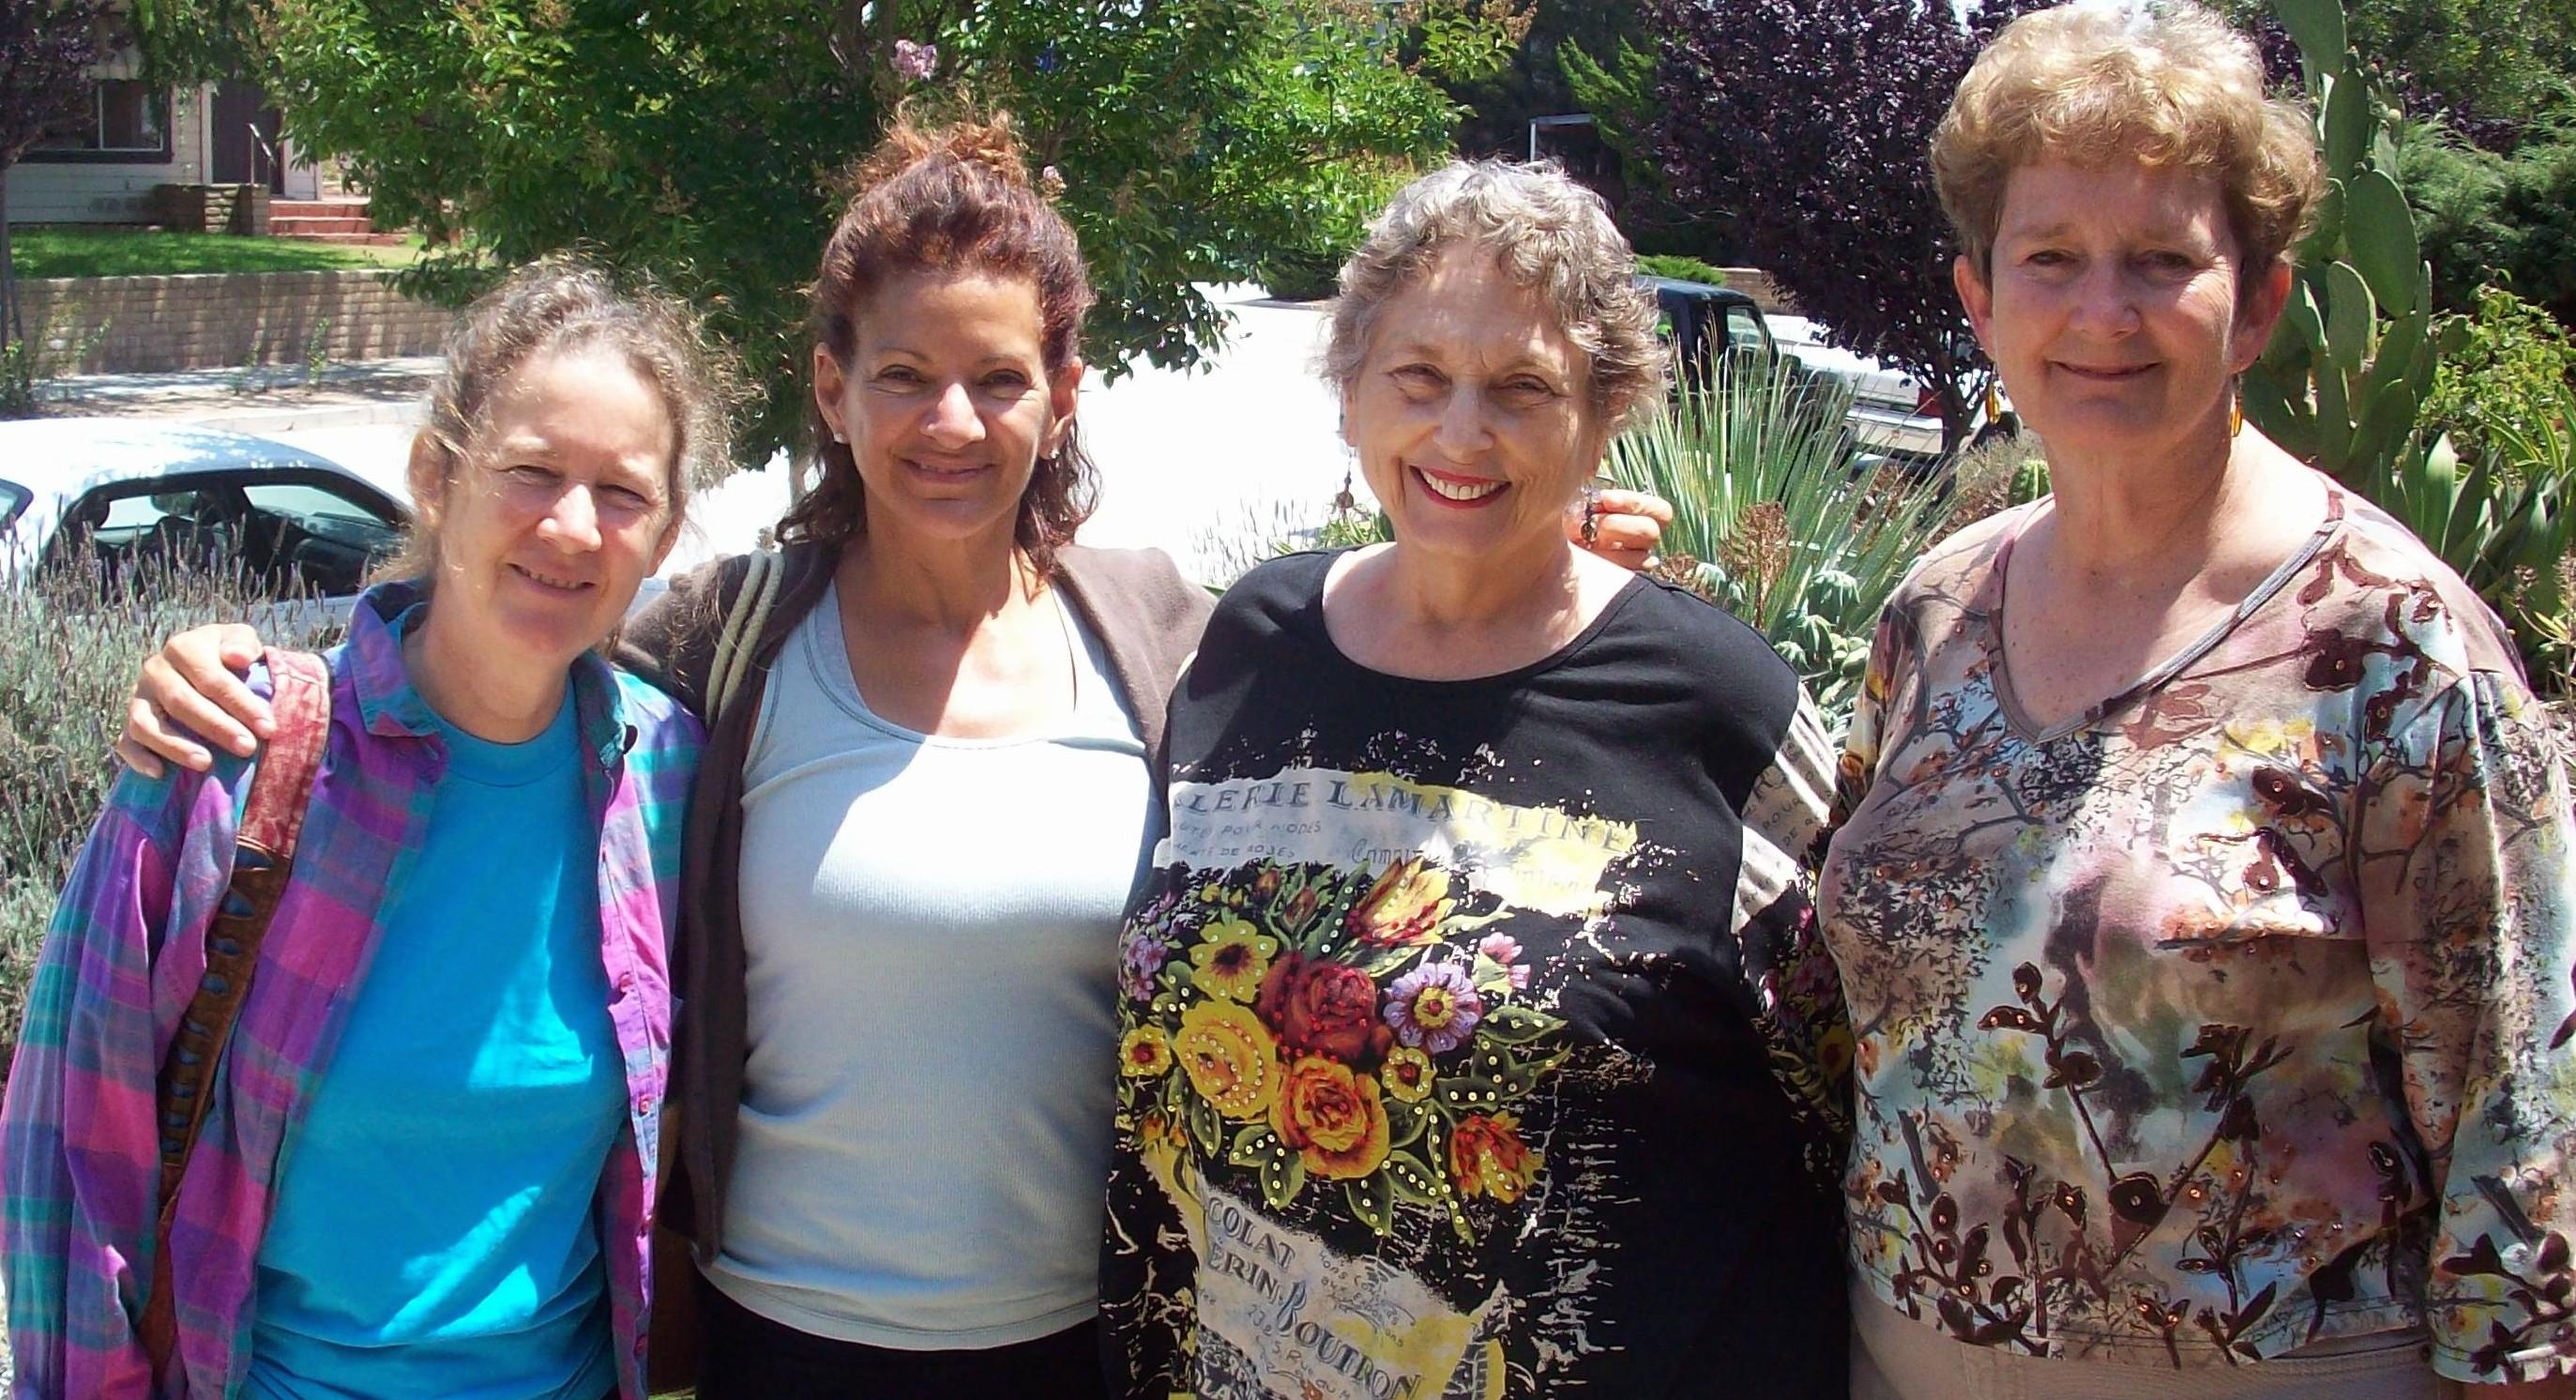 (From left) Rebecca Moore, Jordan Vilchez, Claire Janaro and Laura Johnston Kohl